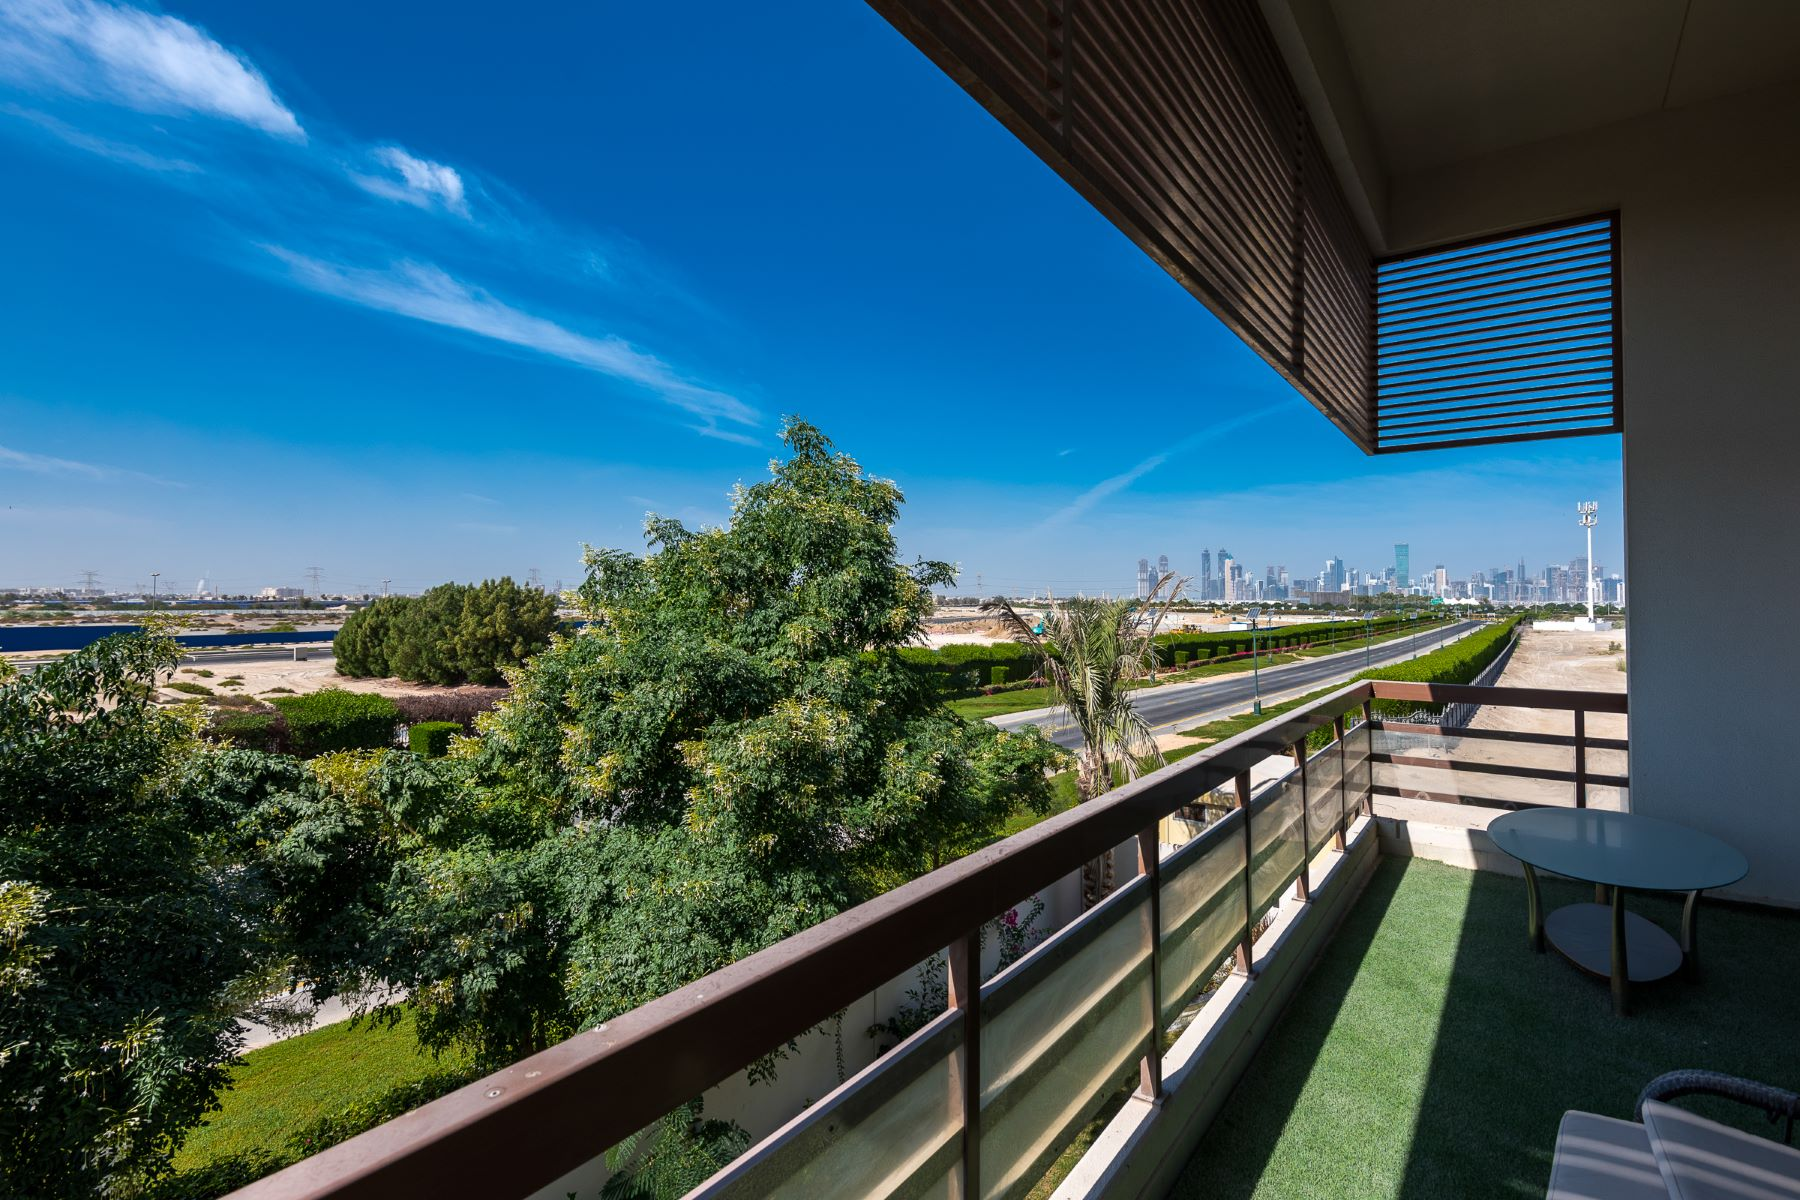 Single Family Home for Sale at Luxury 5 Bed Type C Villa Skyline Views Other Dubai, Dubai United Arab Emirates